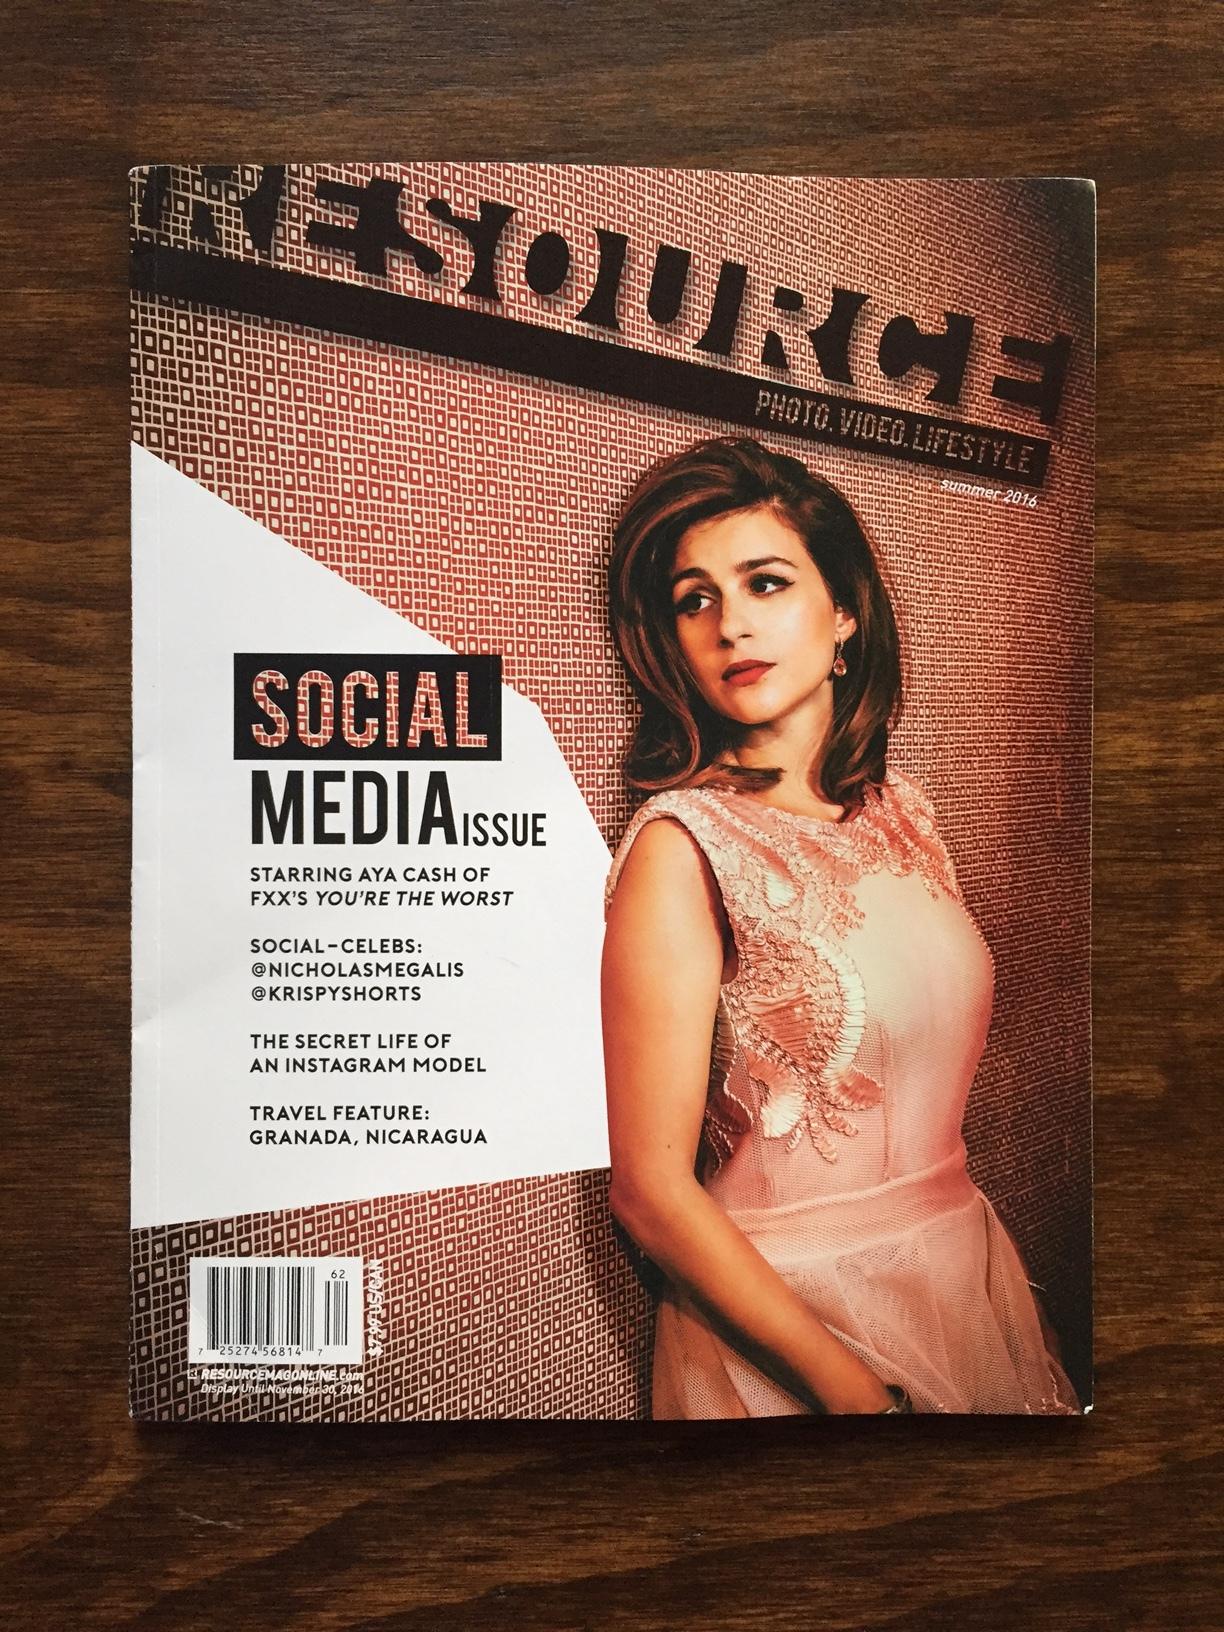 eric-pickersgill-resource-magazine-social-meida-issue-2.JPG